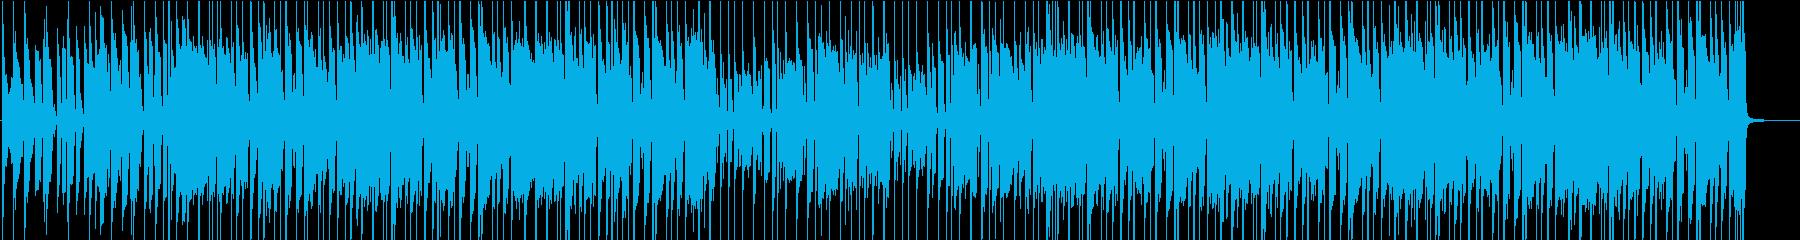 Jackson5風 POPでHAPPYなの再生済みの波形